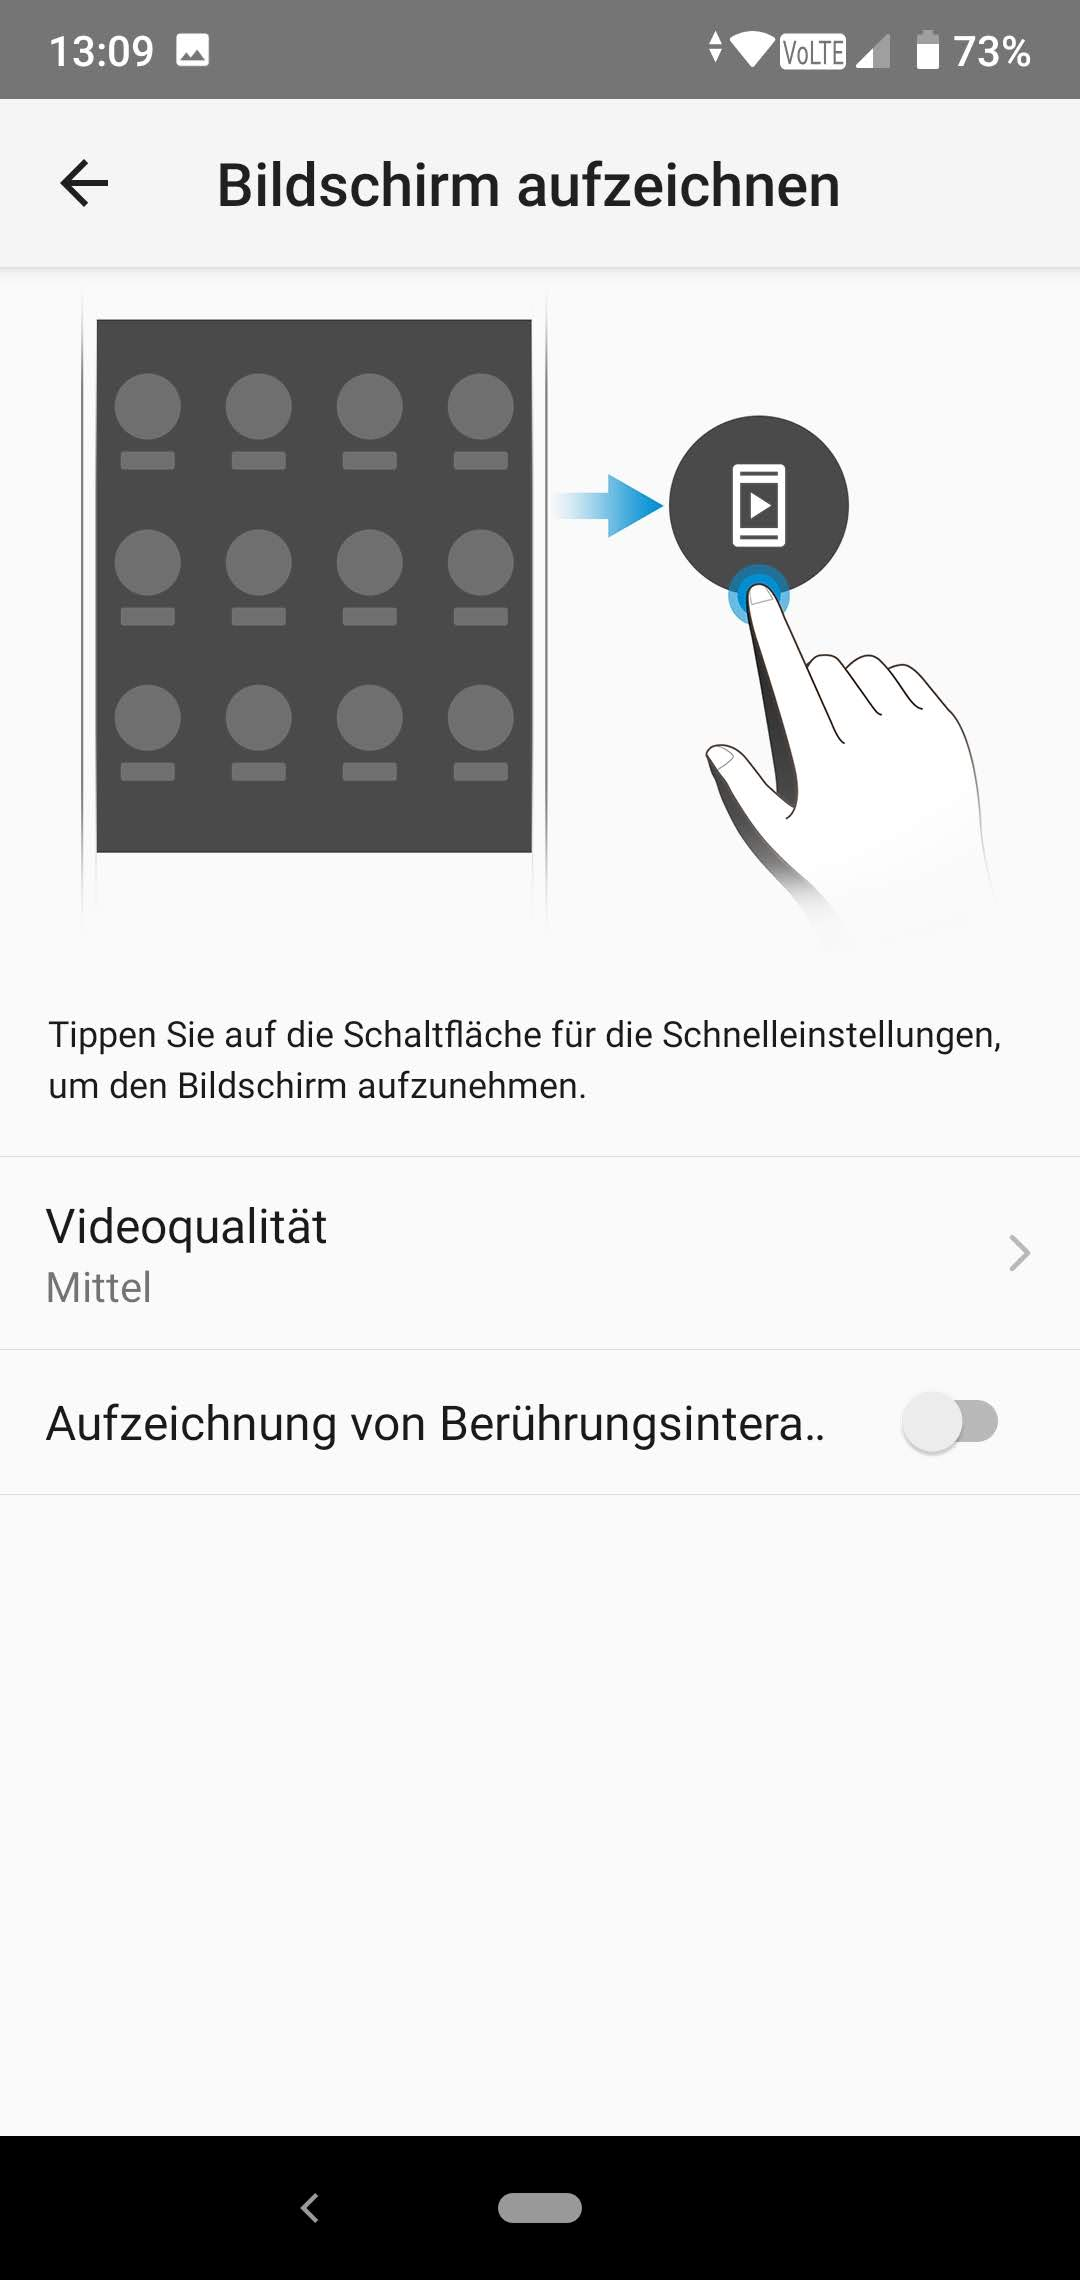 Zte Blade V10 Android Screenshot 2019 05 26 13 09 04